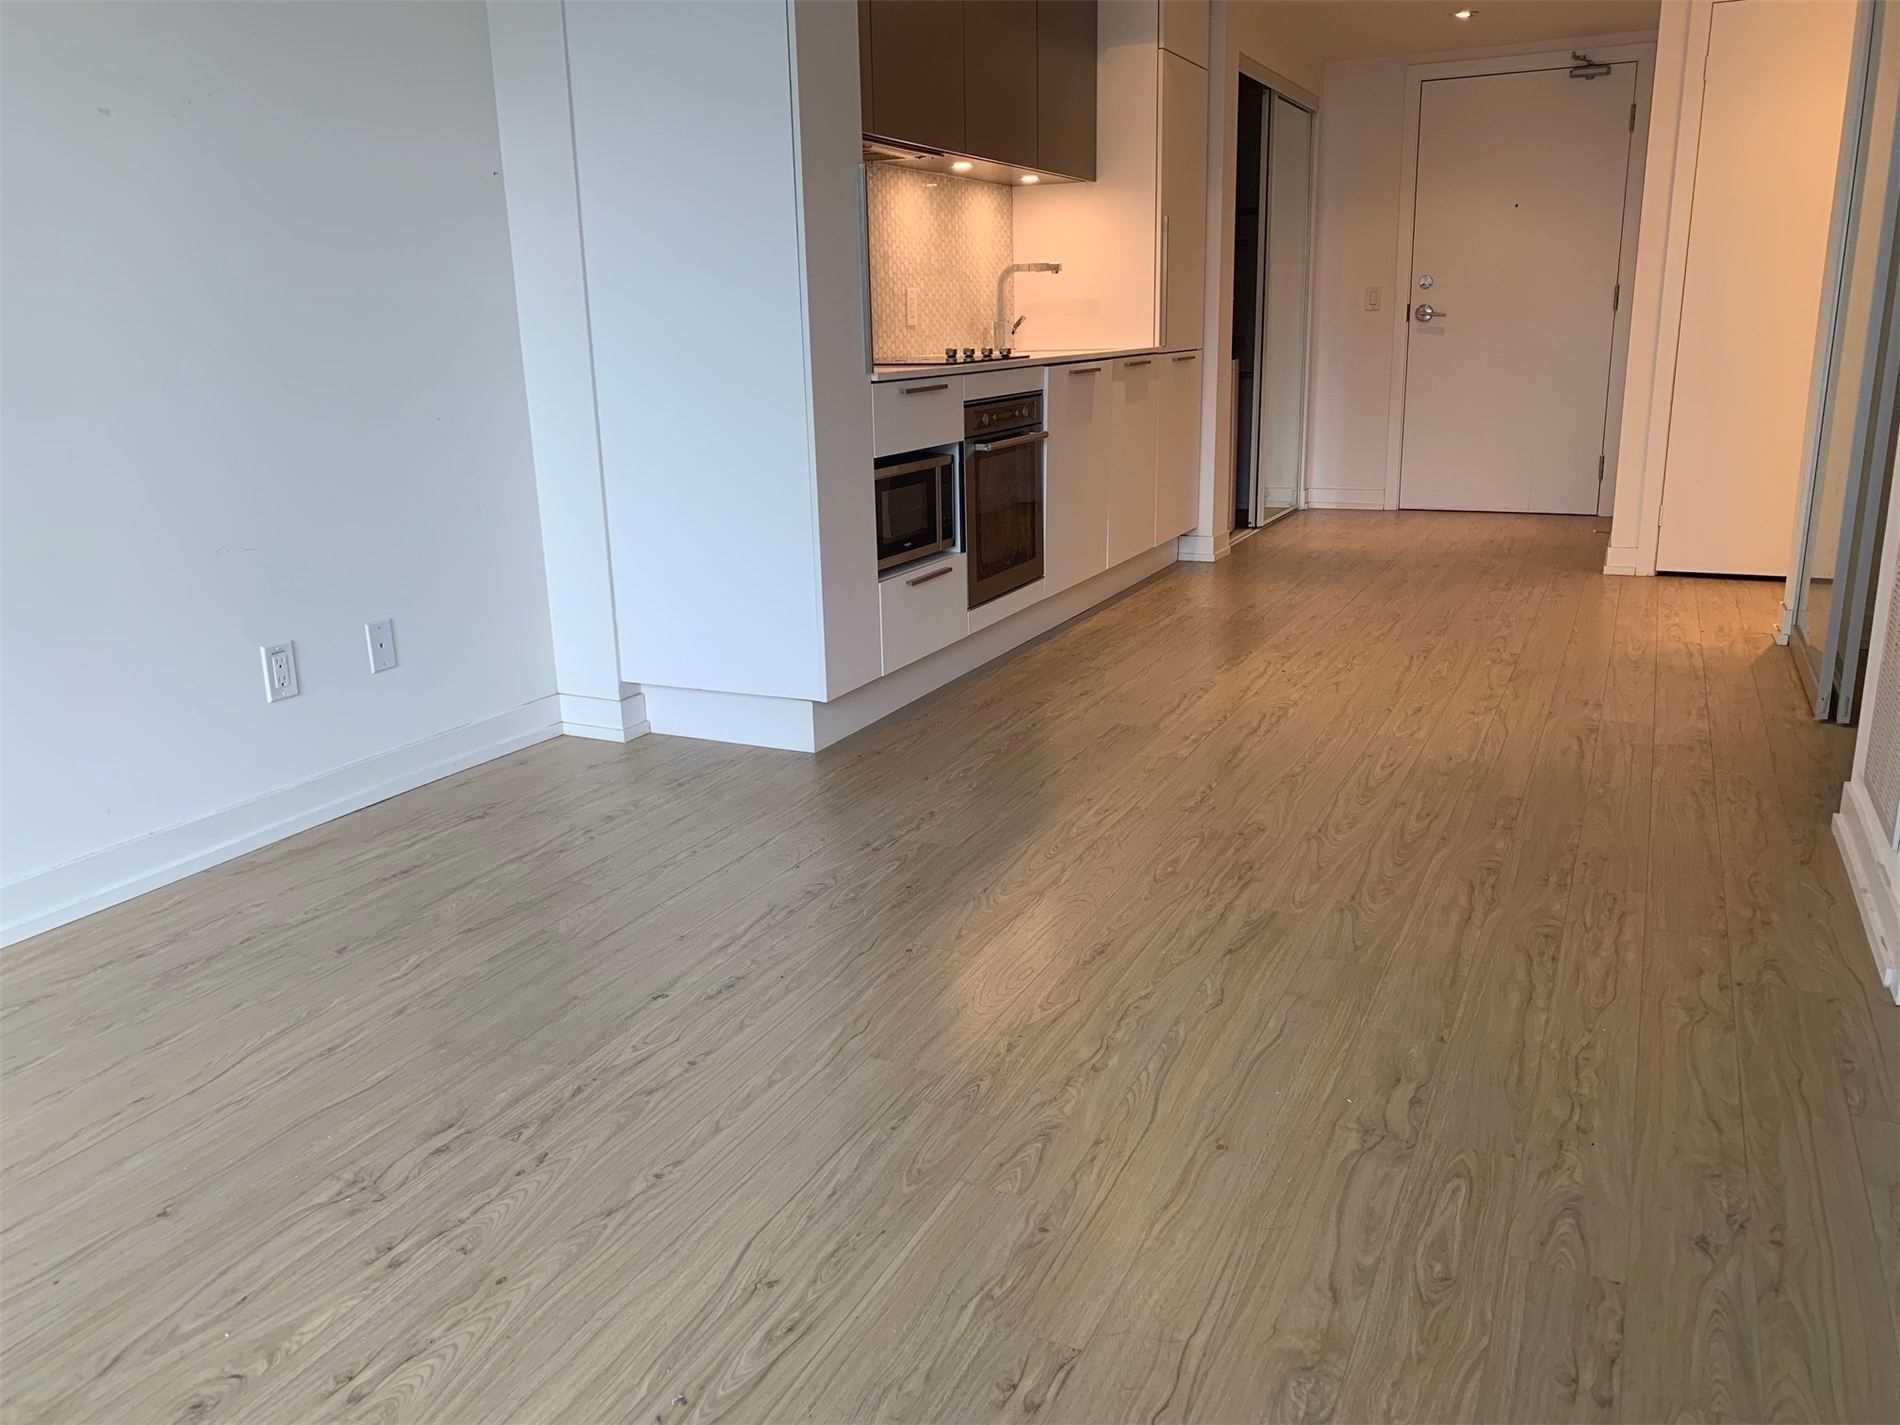 1001 - 85 Wood St - Church-Yonge Corridor Condo Apt for sale, 1 Bedroom (C5221011) - #8